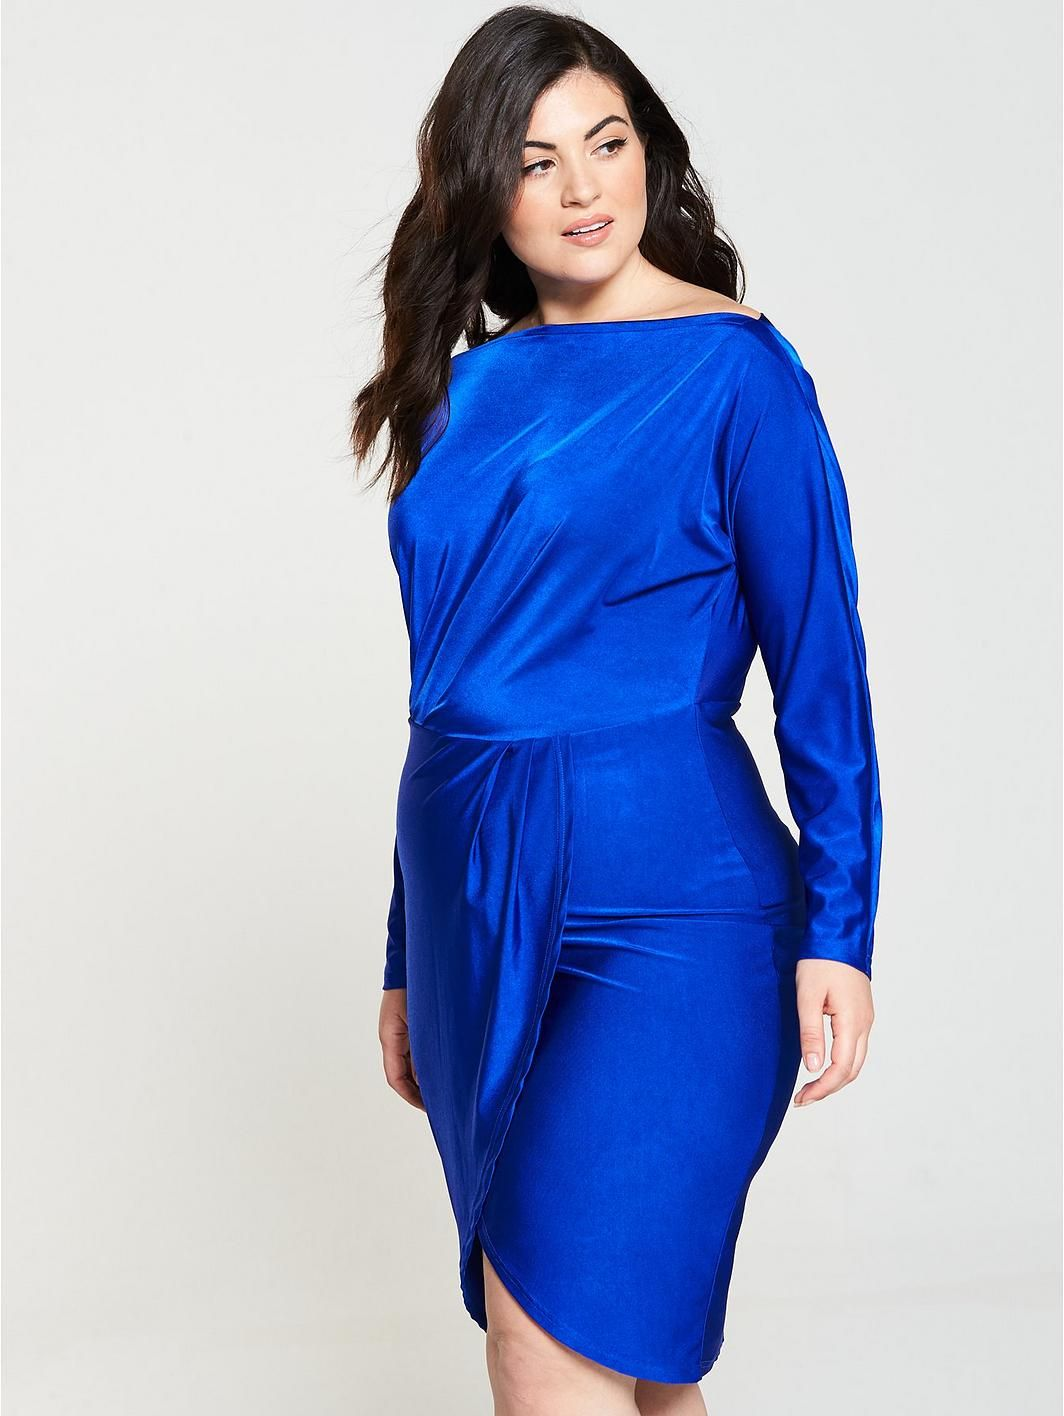 e3c55f4a574 AX PARIS CURVE Slinky Off Shoulder Bodycon Midi Dress - Cobalt Blue ...